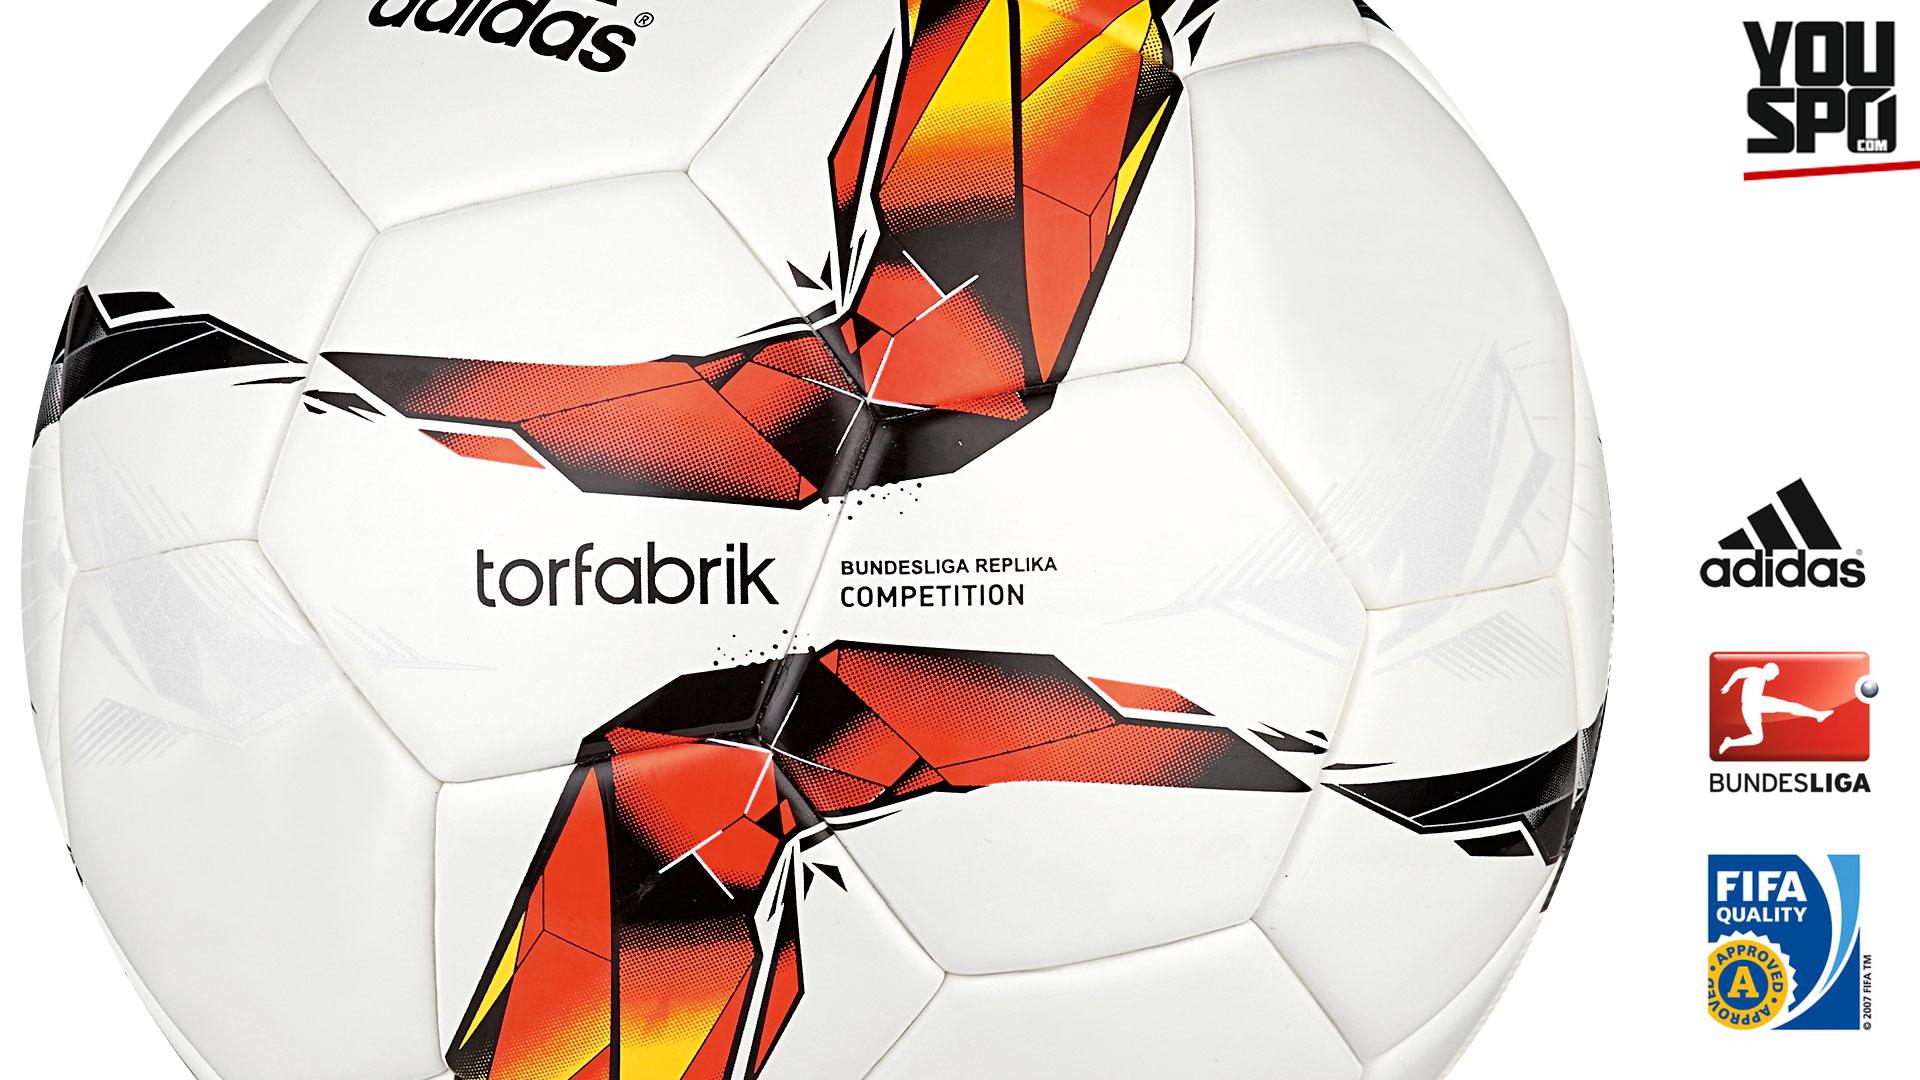 Adidas Torfarbik 15/16 Competition (2015-2016)